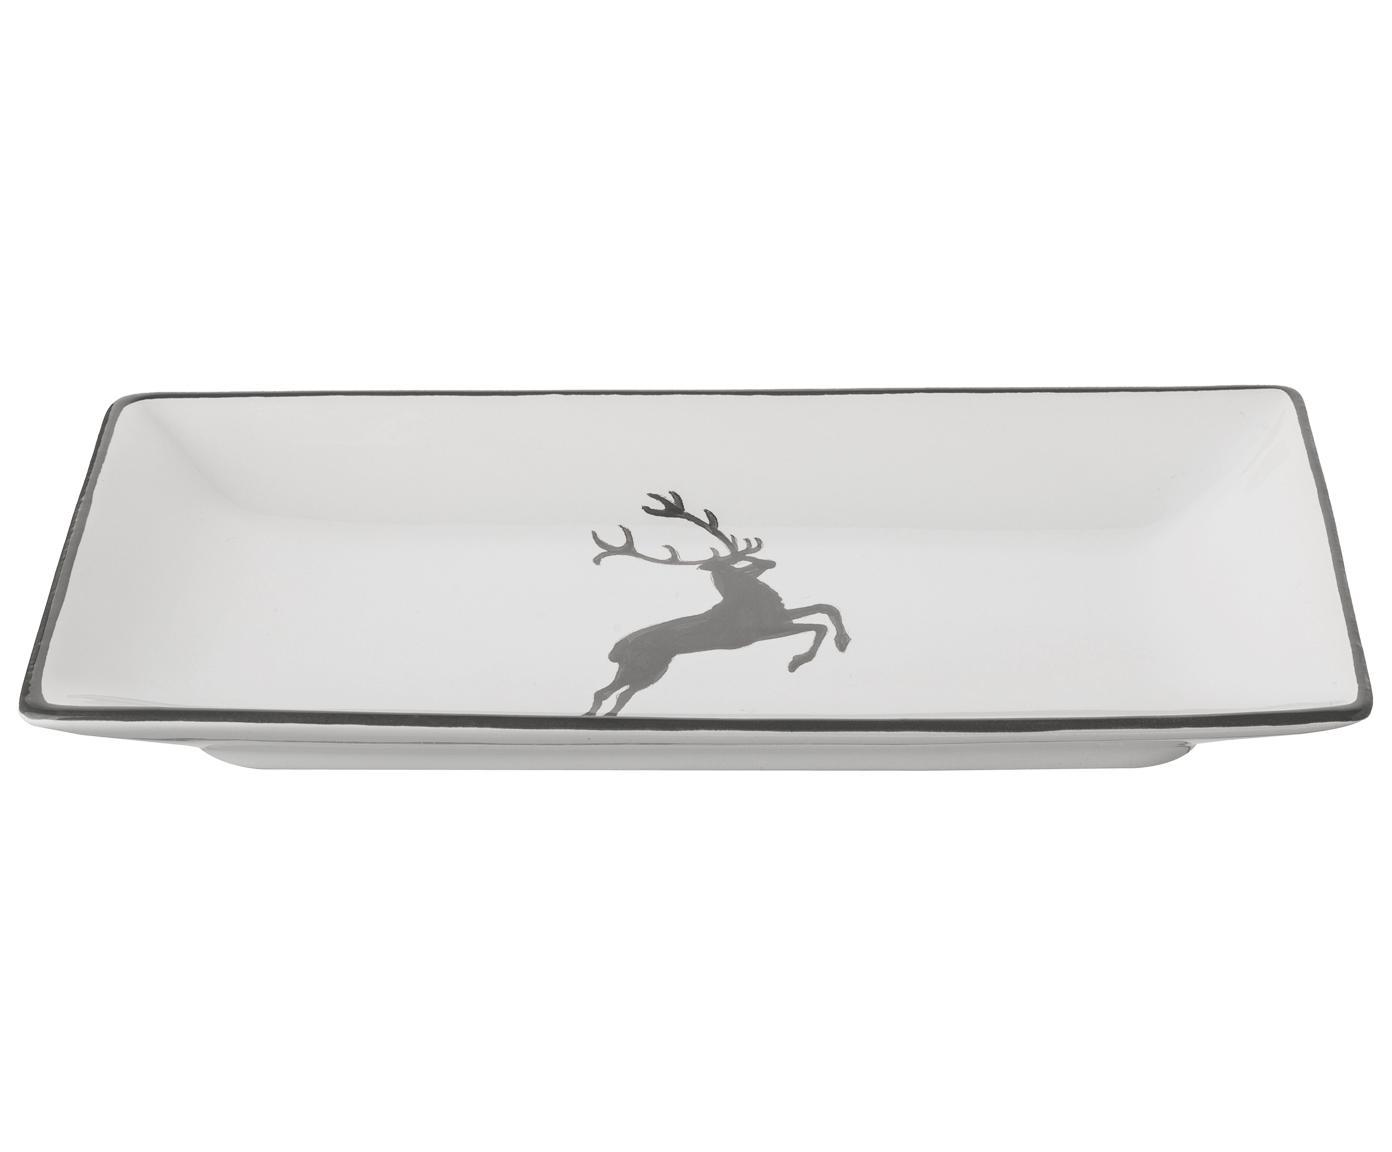 Półmisek Grauer Hirsch, Ceramika, Szary, biały, 11 x 22 cm